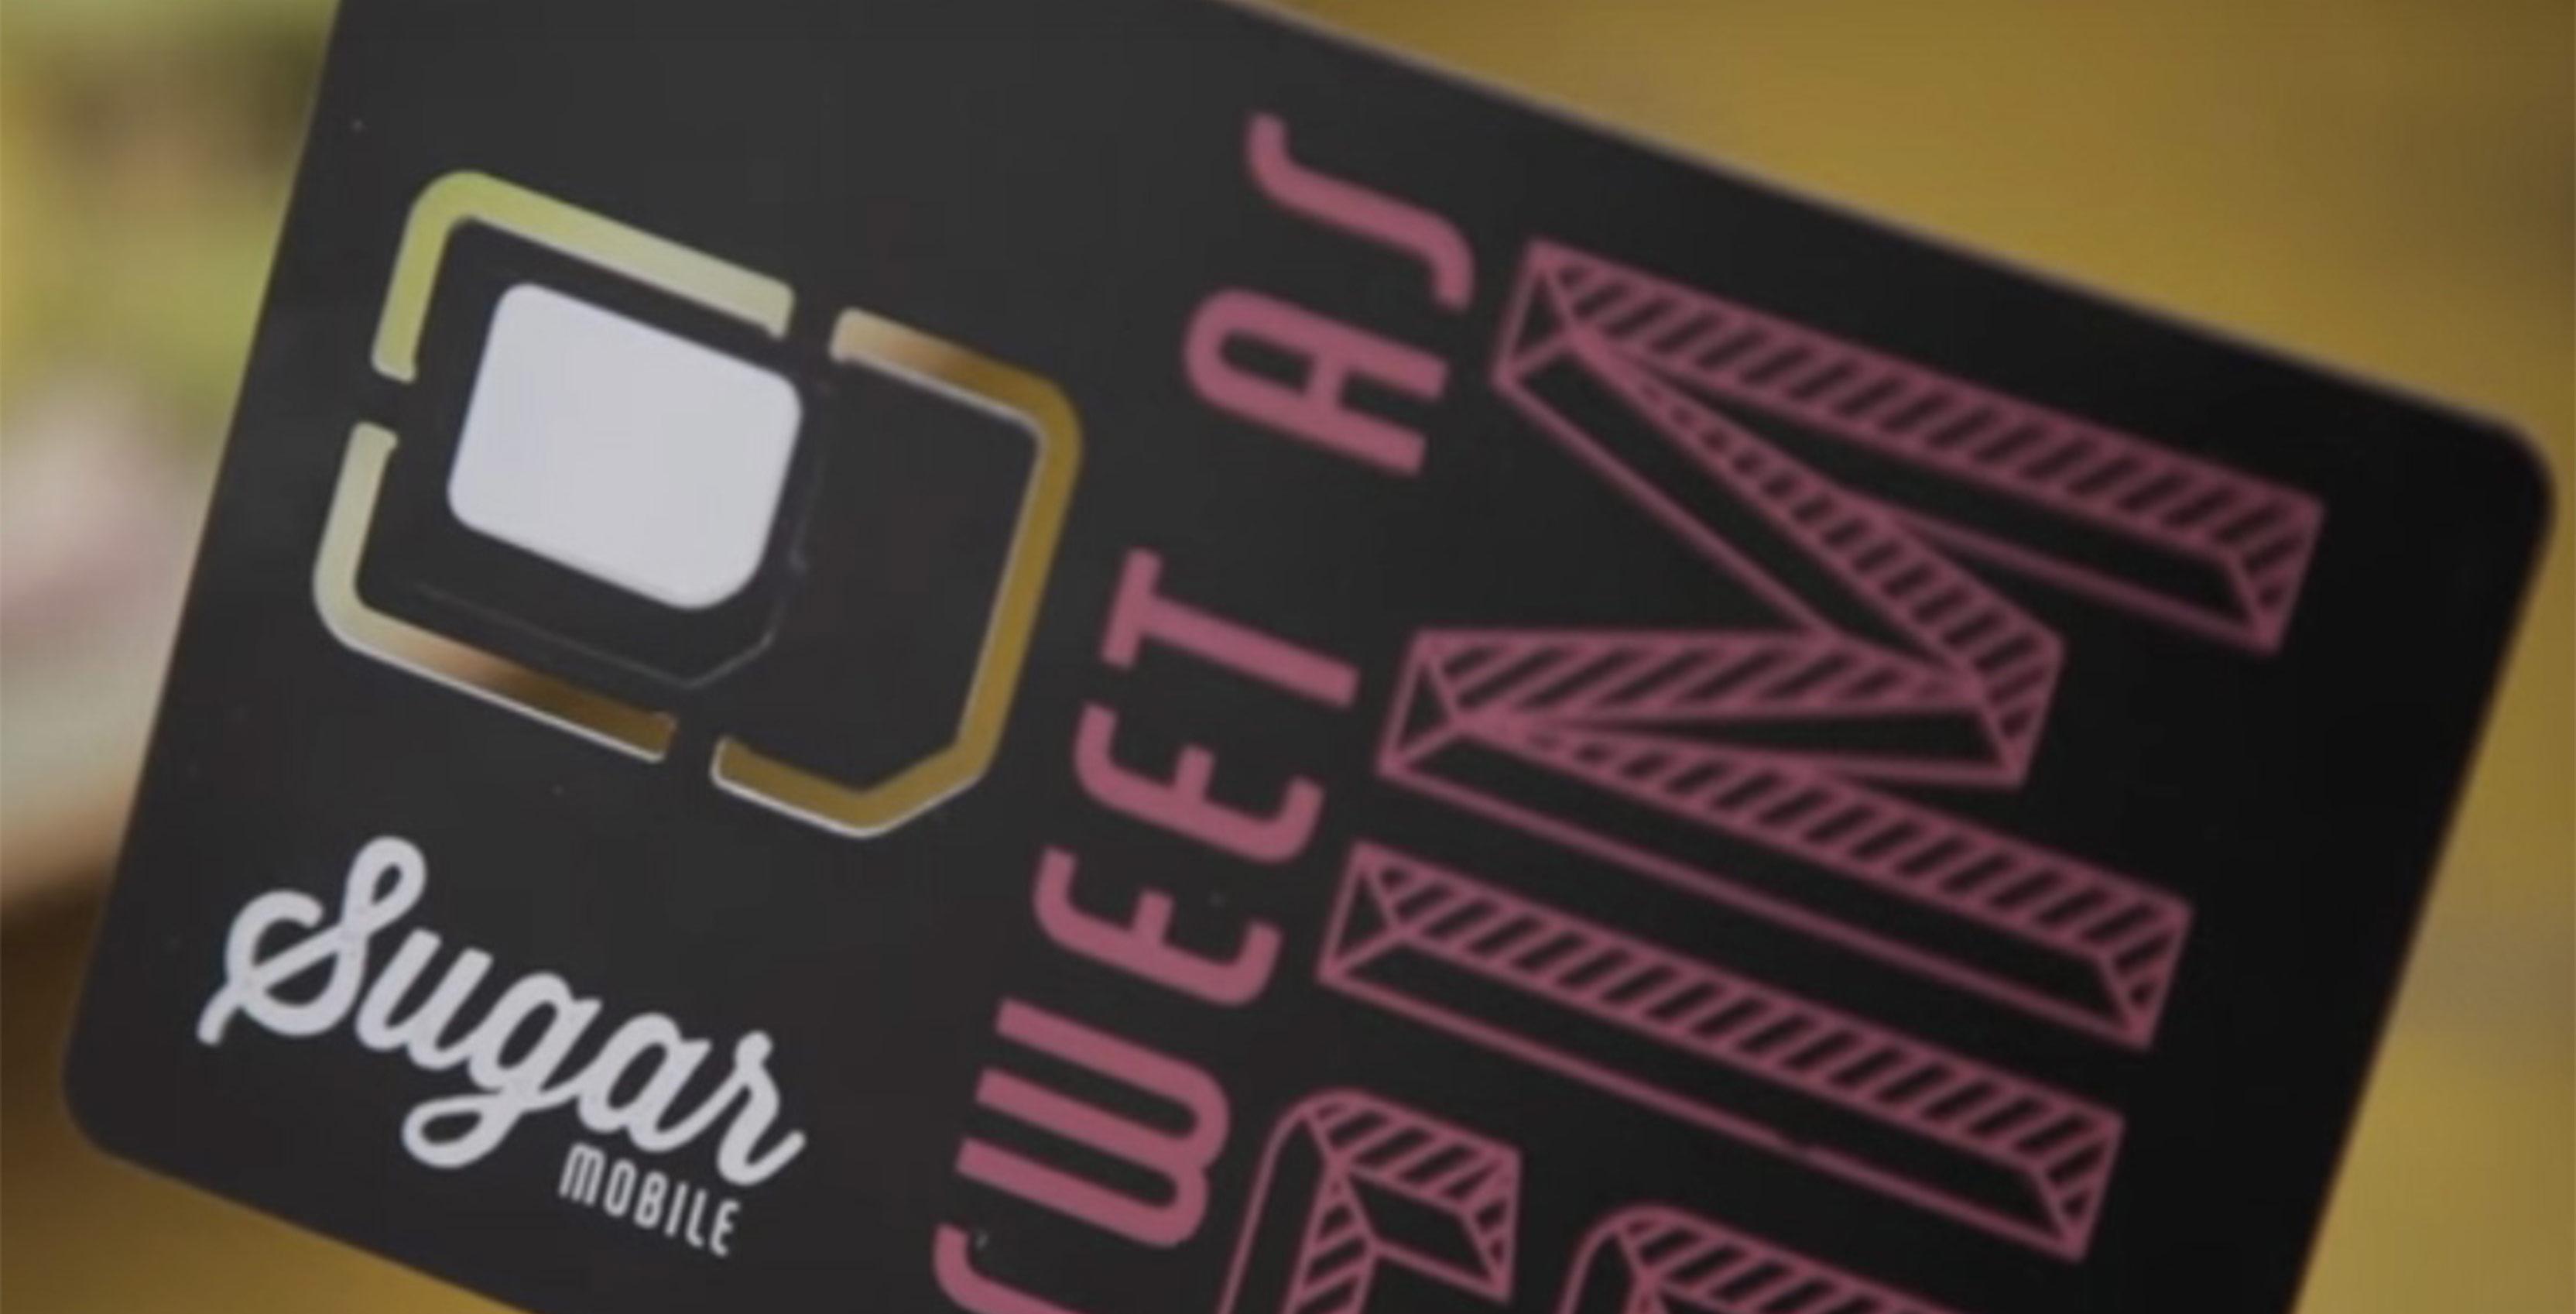 Sugar Mobile SIM card